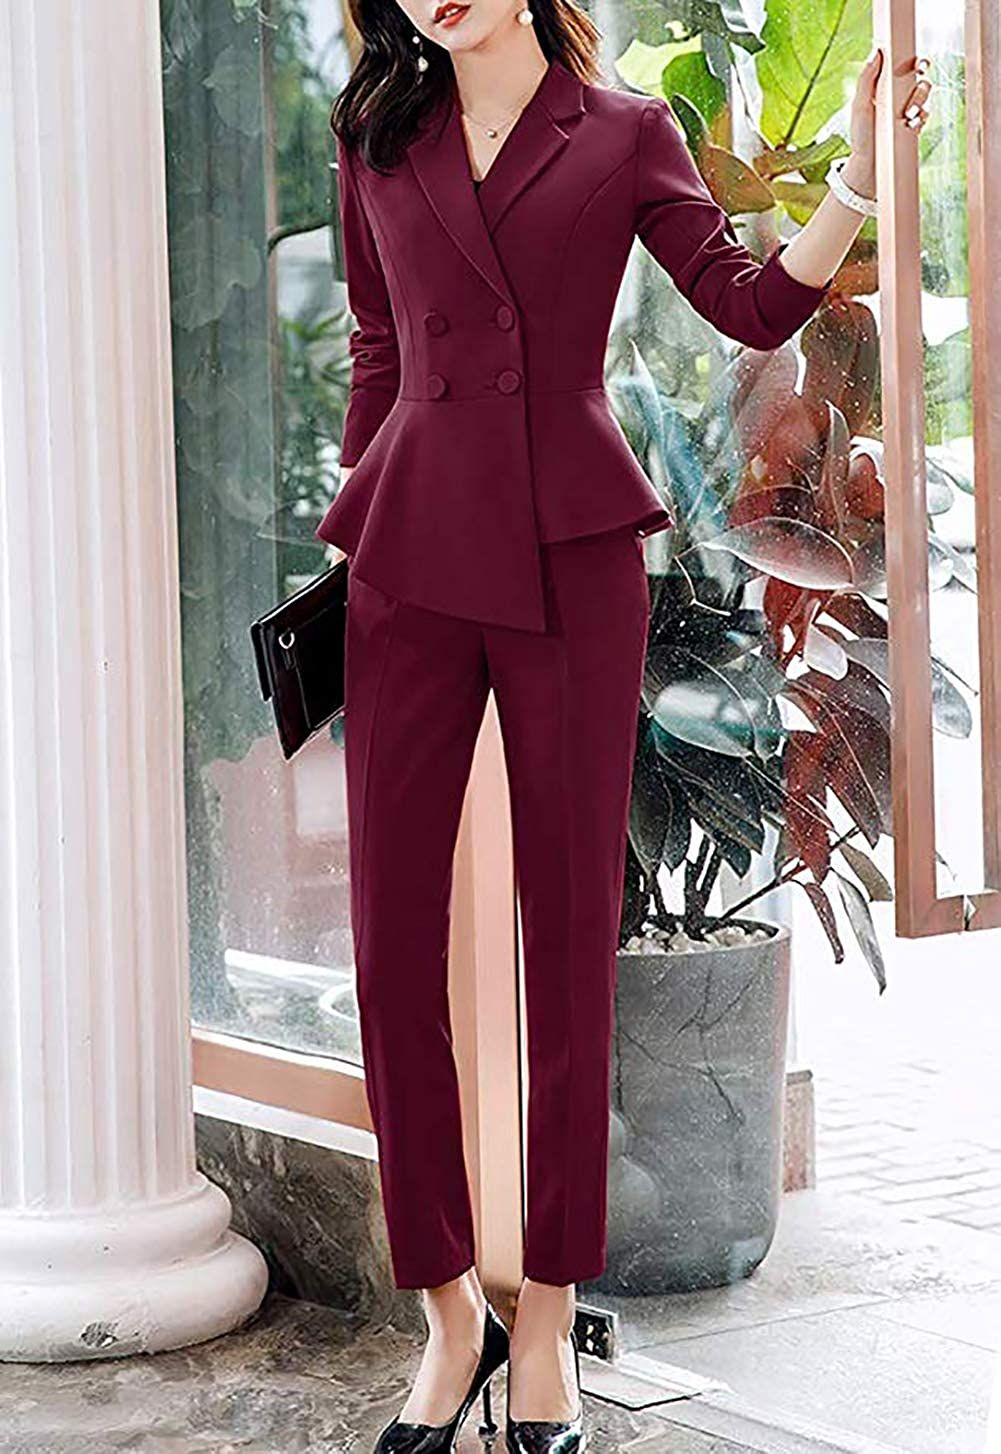 LISUEYNE Women/'s Elegant 2 Piece Office Lady Business Suit Set Slim Fit Work Suits for Women Blazer Jacket,Skirt Suits